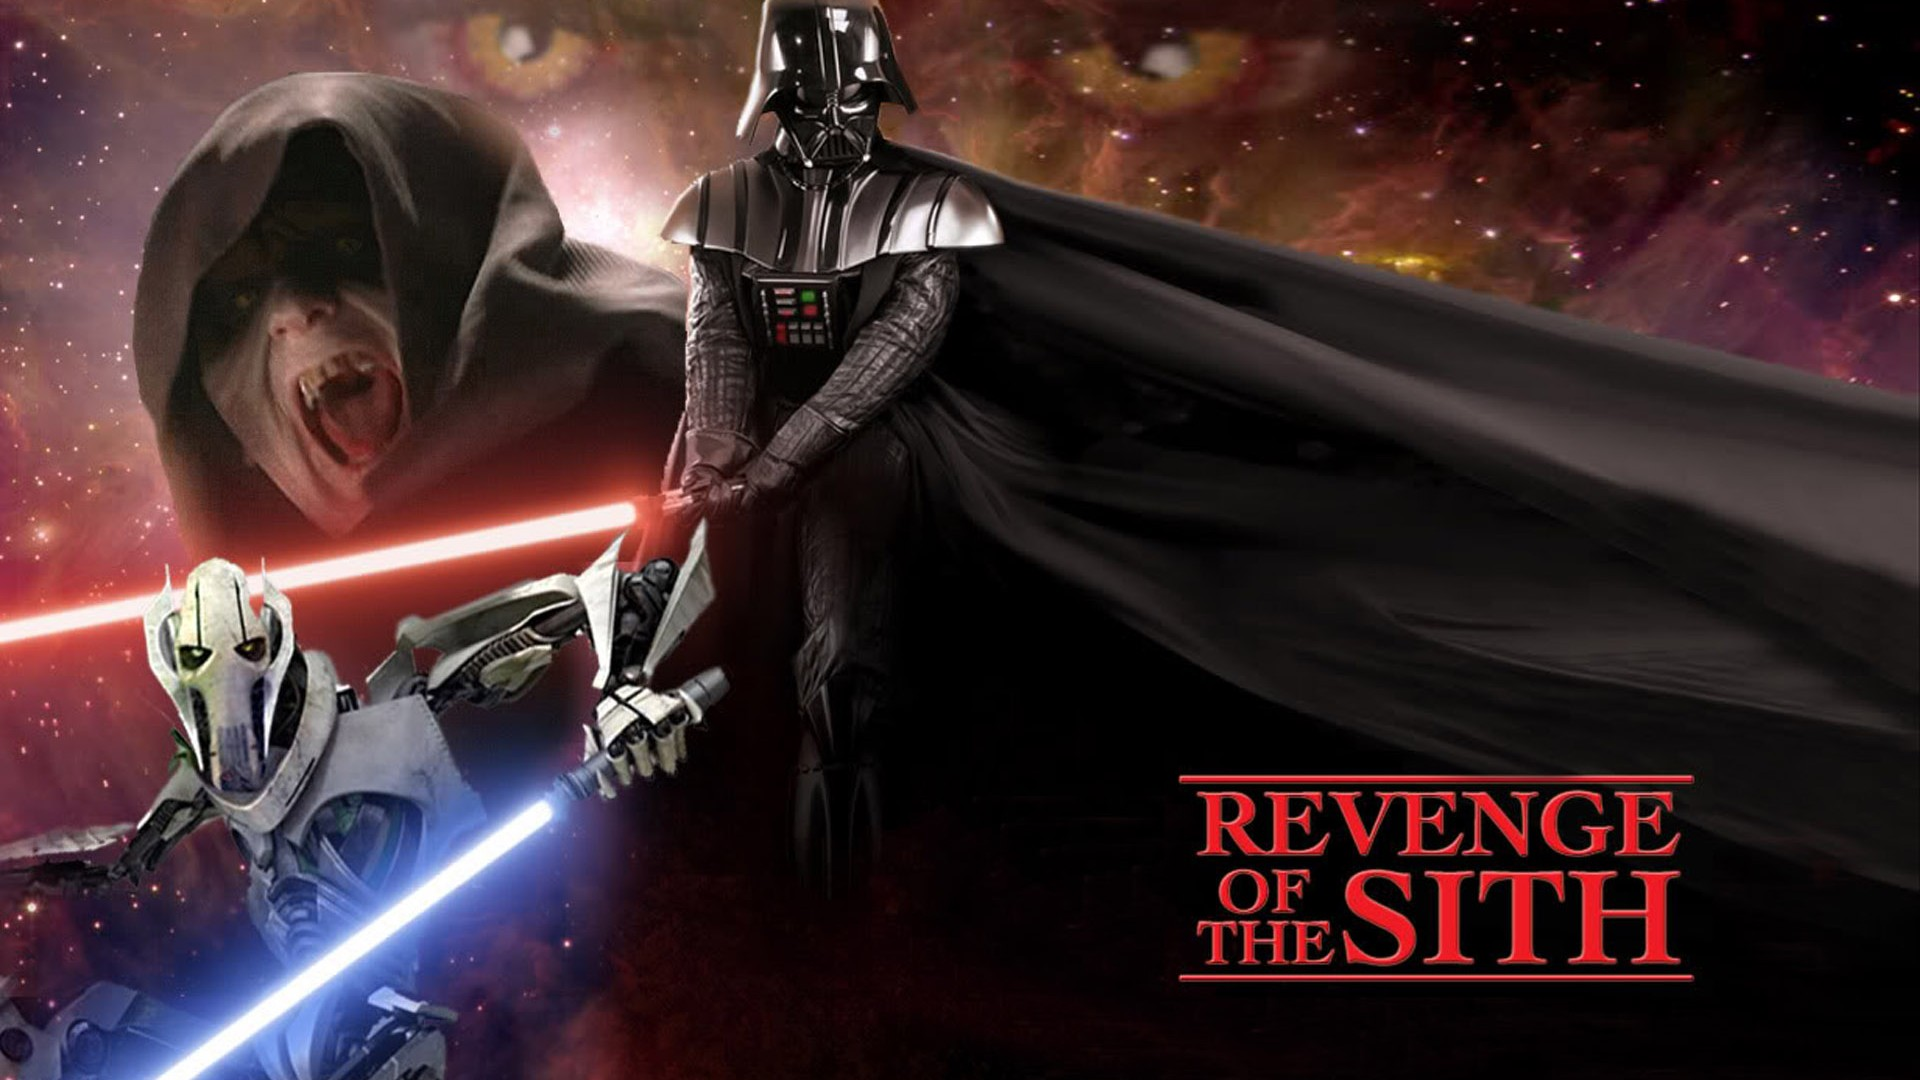 Star Wars Episode Iii Star Wars 9 Palpatine 373874 Hd Wallpaper Backgrounds Download